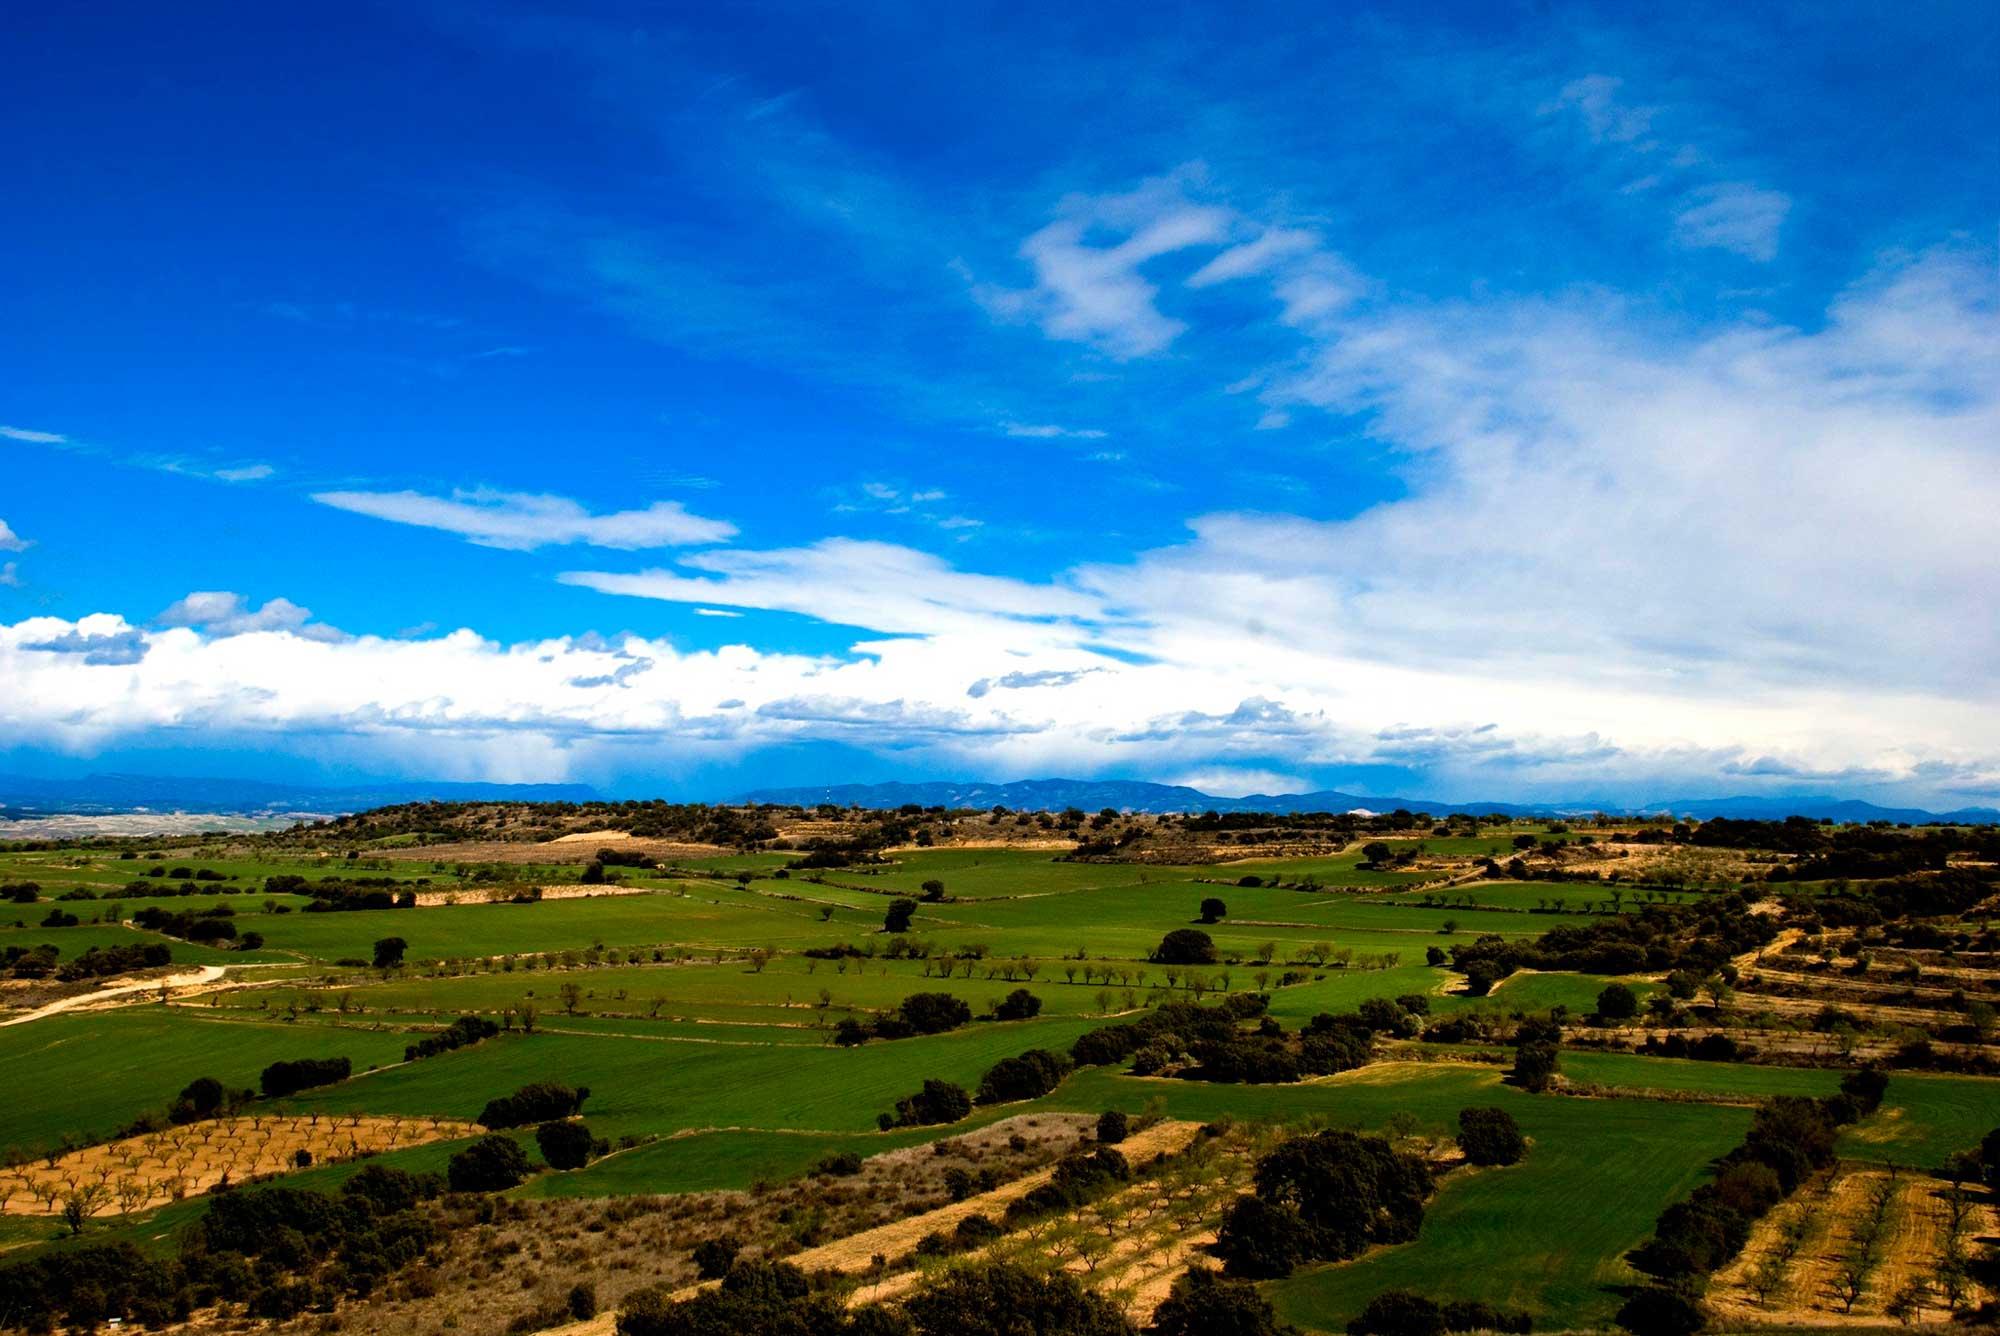 Somontano_de_Barbastro,_Lagunarrota_(Huesca,_Aragón)CONGRESOSBARBASTRO